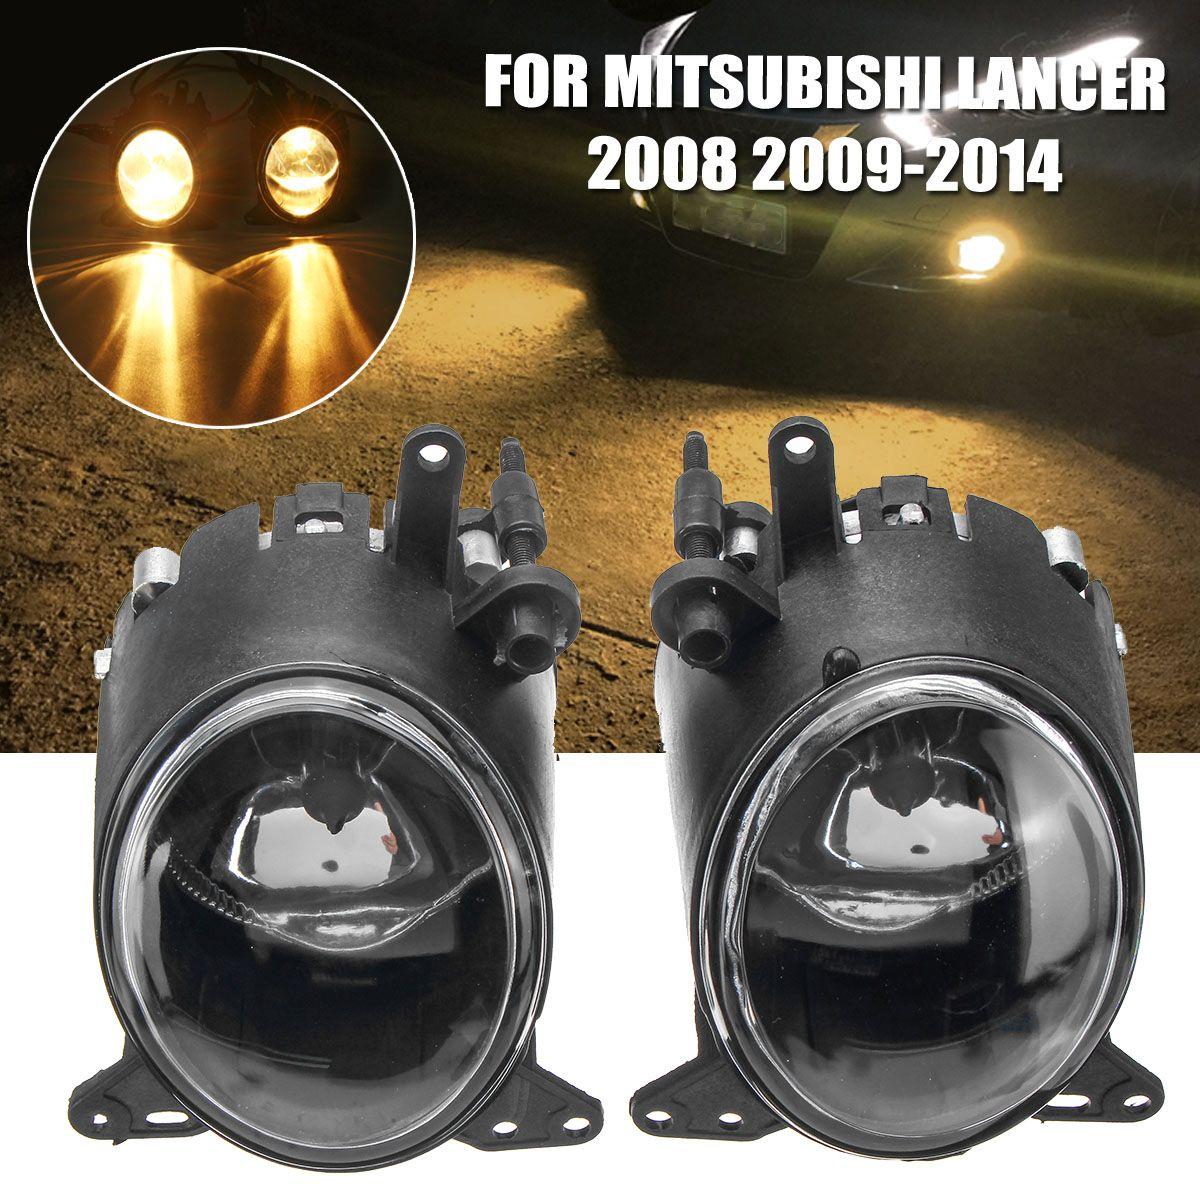 Fog Light Fog Lamp Assembly For Mitsubish Lancer 2008 2009 2010 2011 2012 2013 2014 LED Car Light Auto Accessories